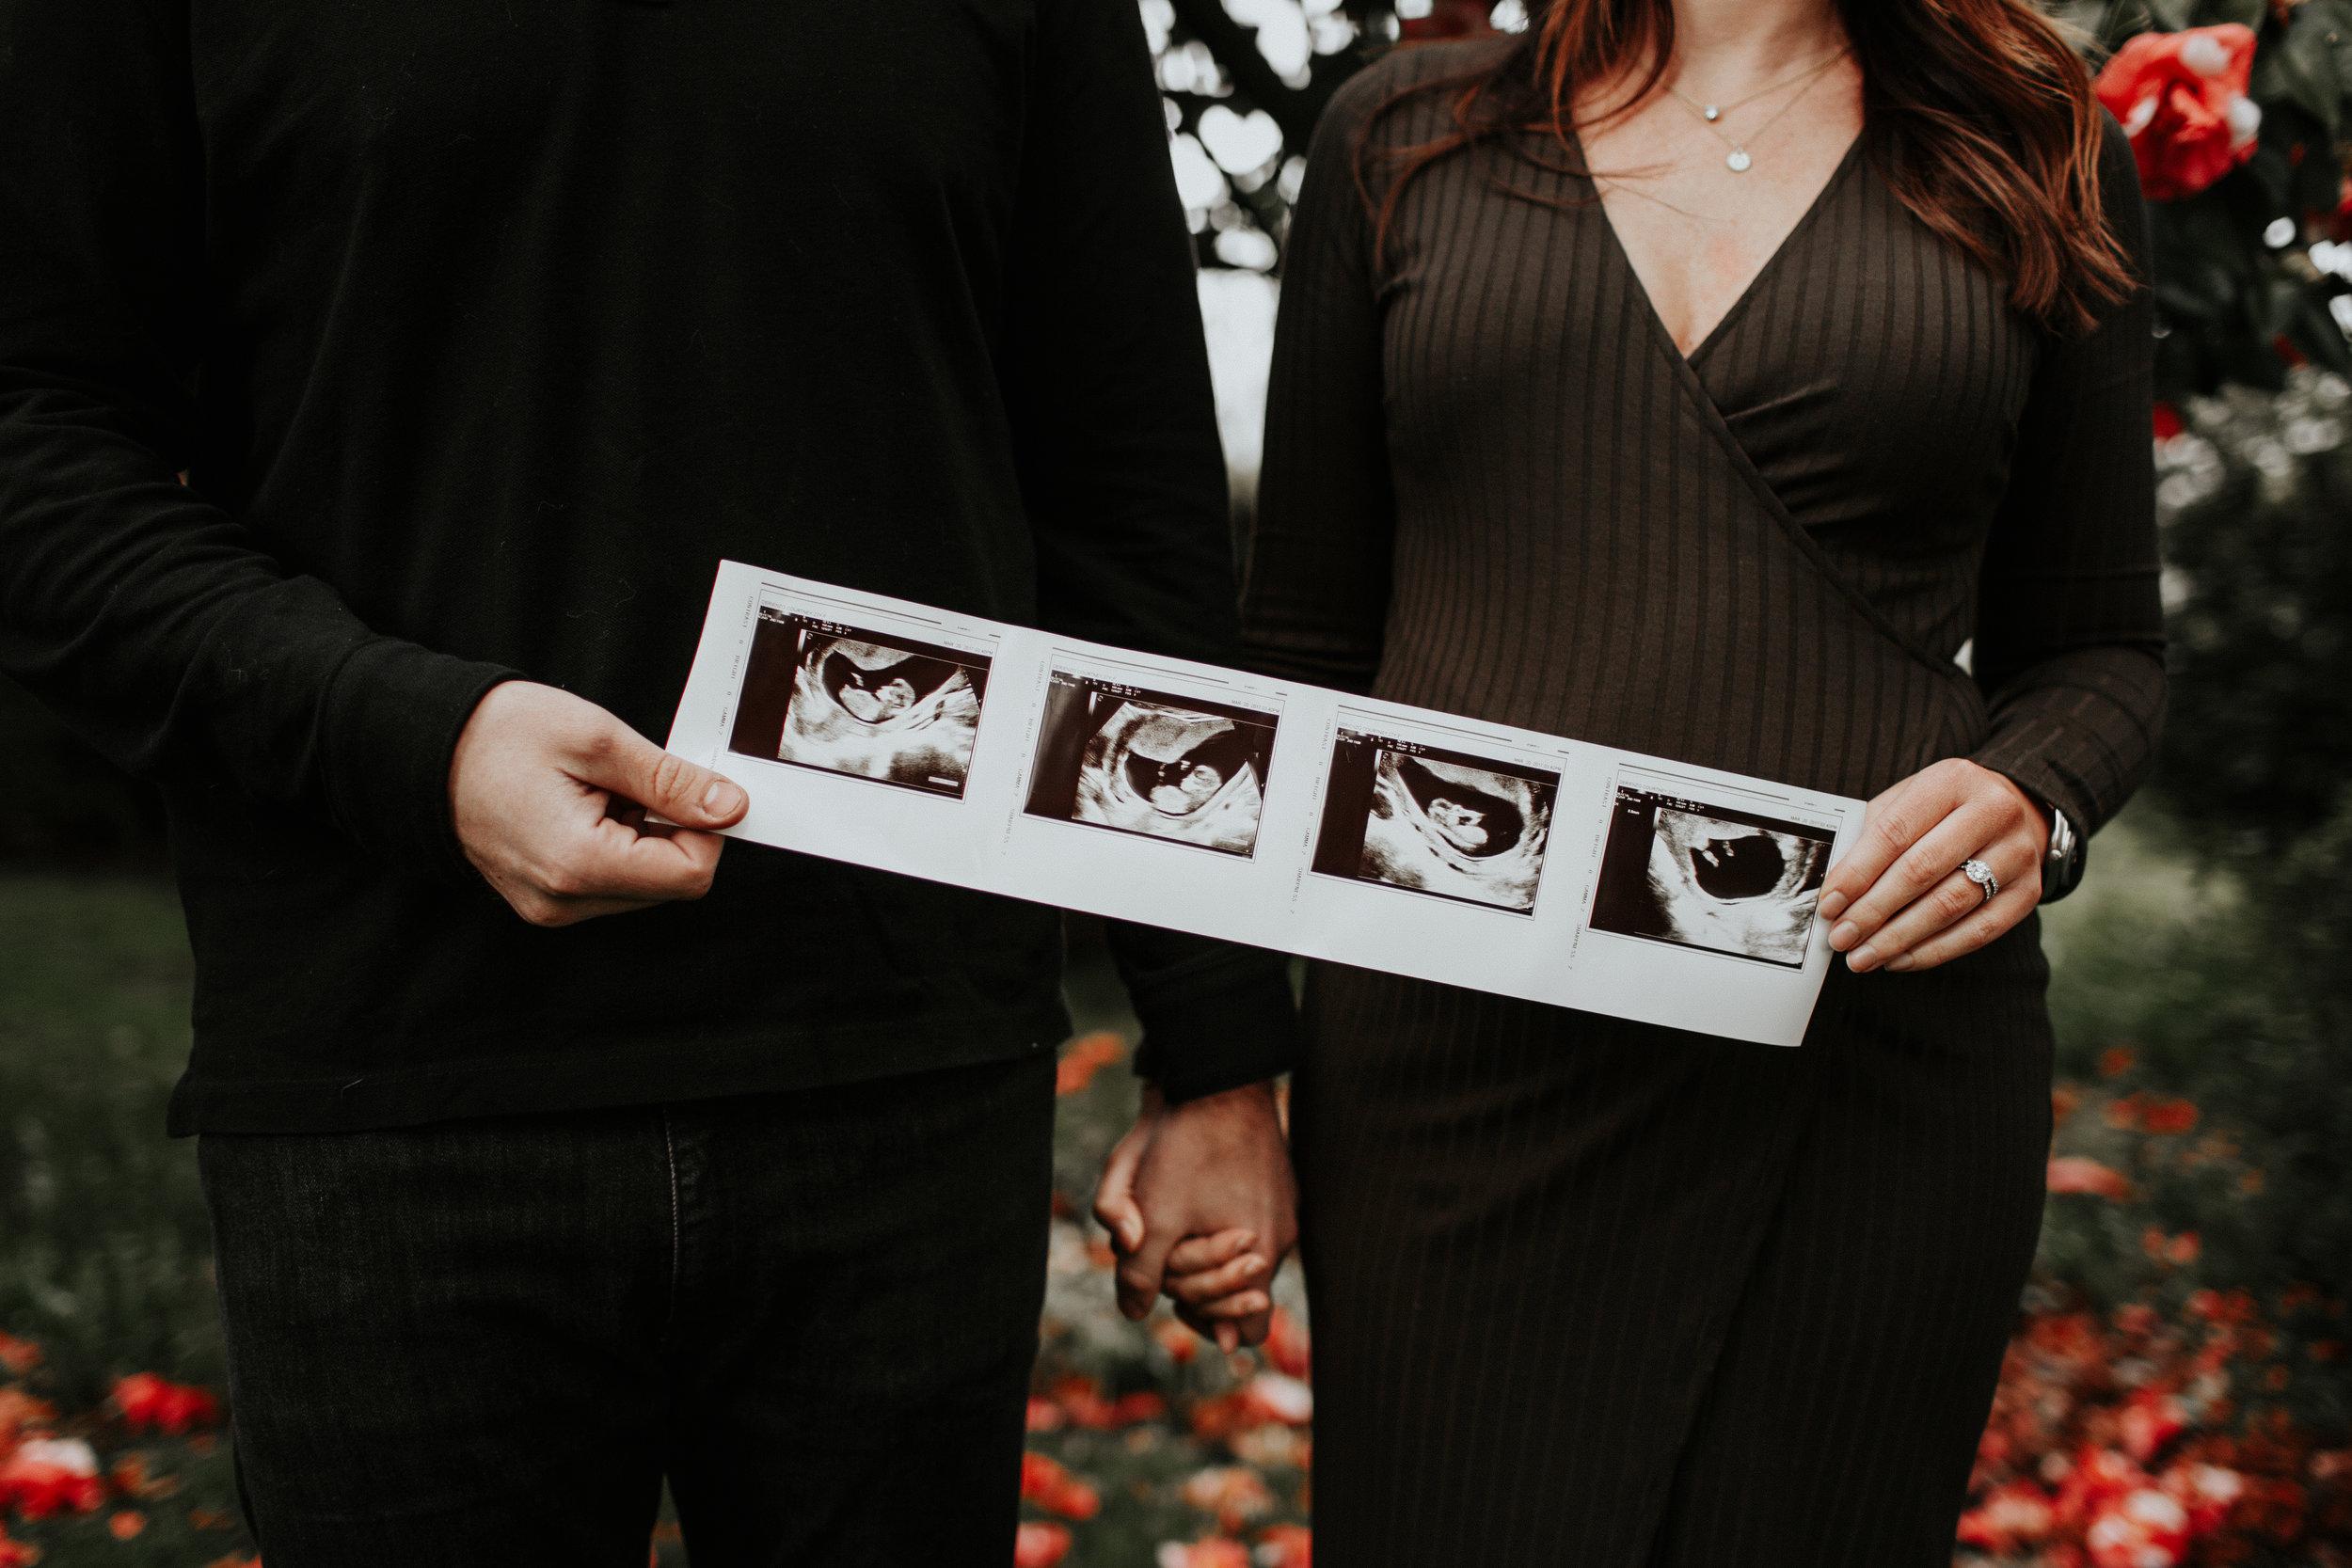 ginapaulson_courtney_maternityannouncement-18.jpg